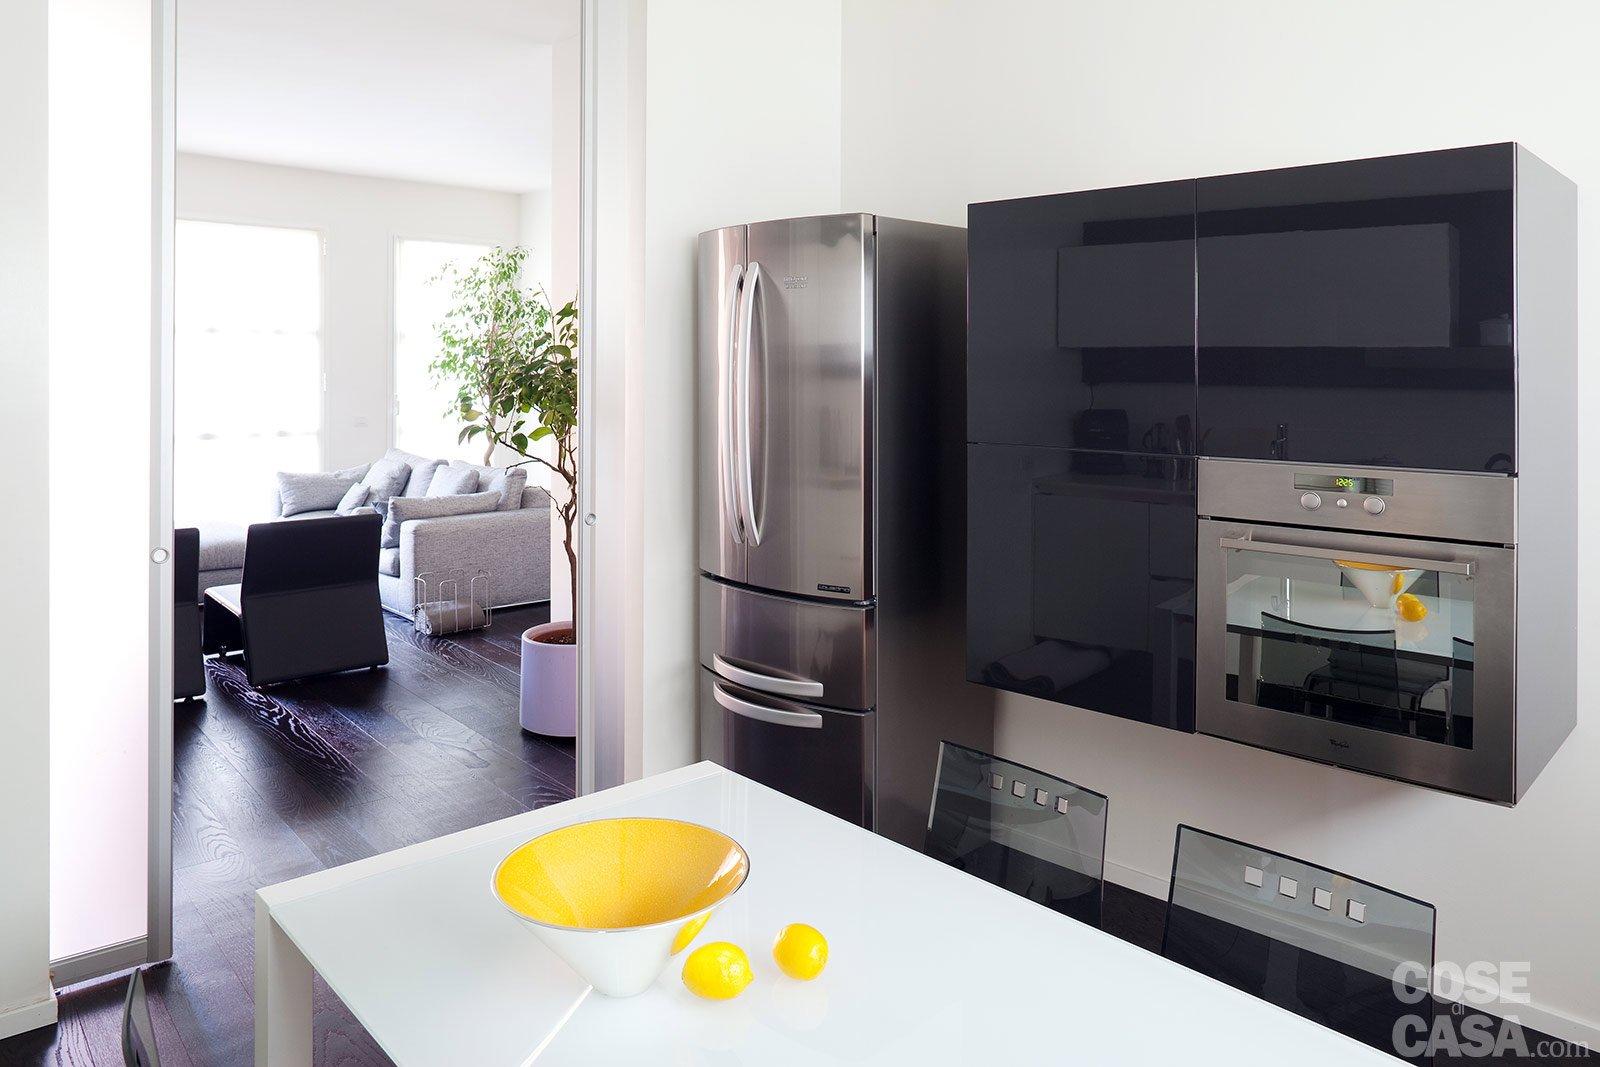 Una casa ristrutturata puntando sull 39 efficienza energetica - Cucina in casa ...